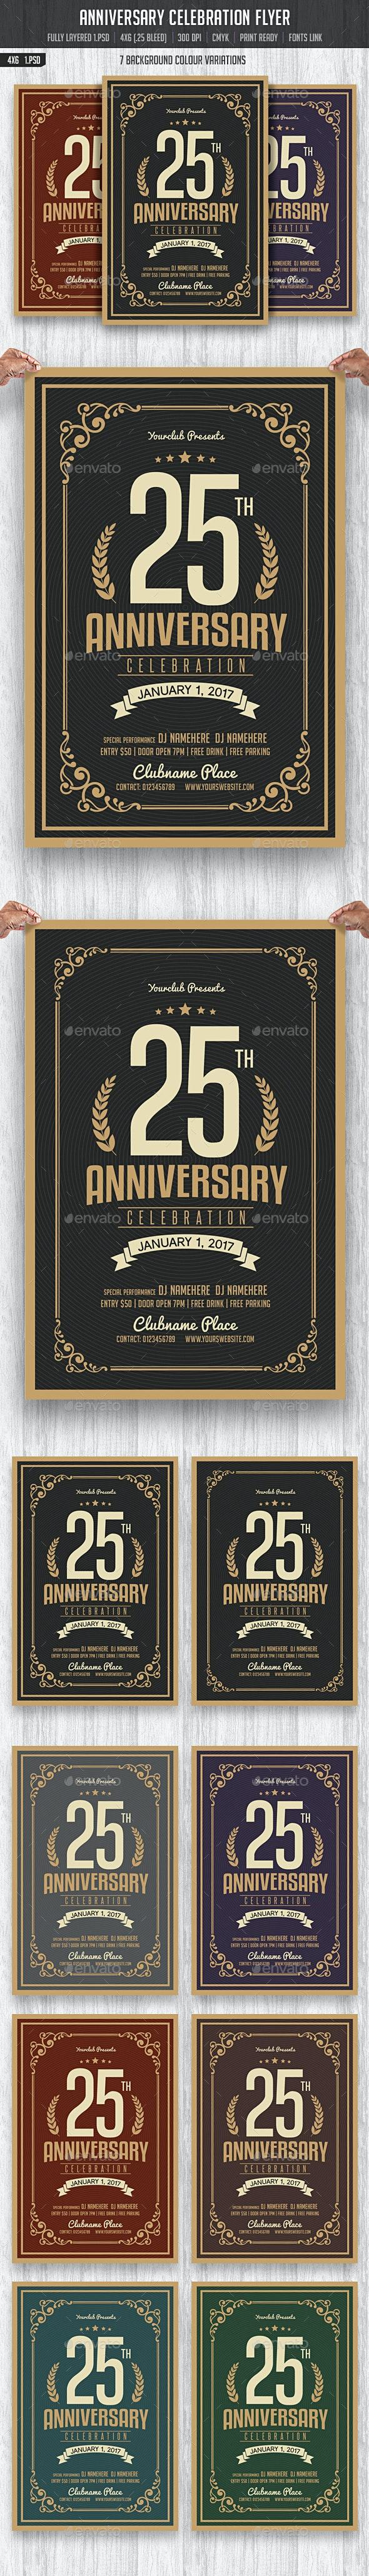 Anniversary Celebration Flyer - Events Flyers